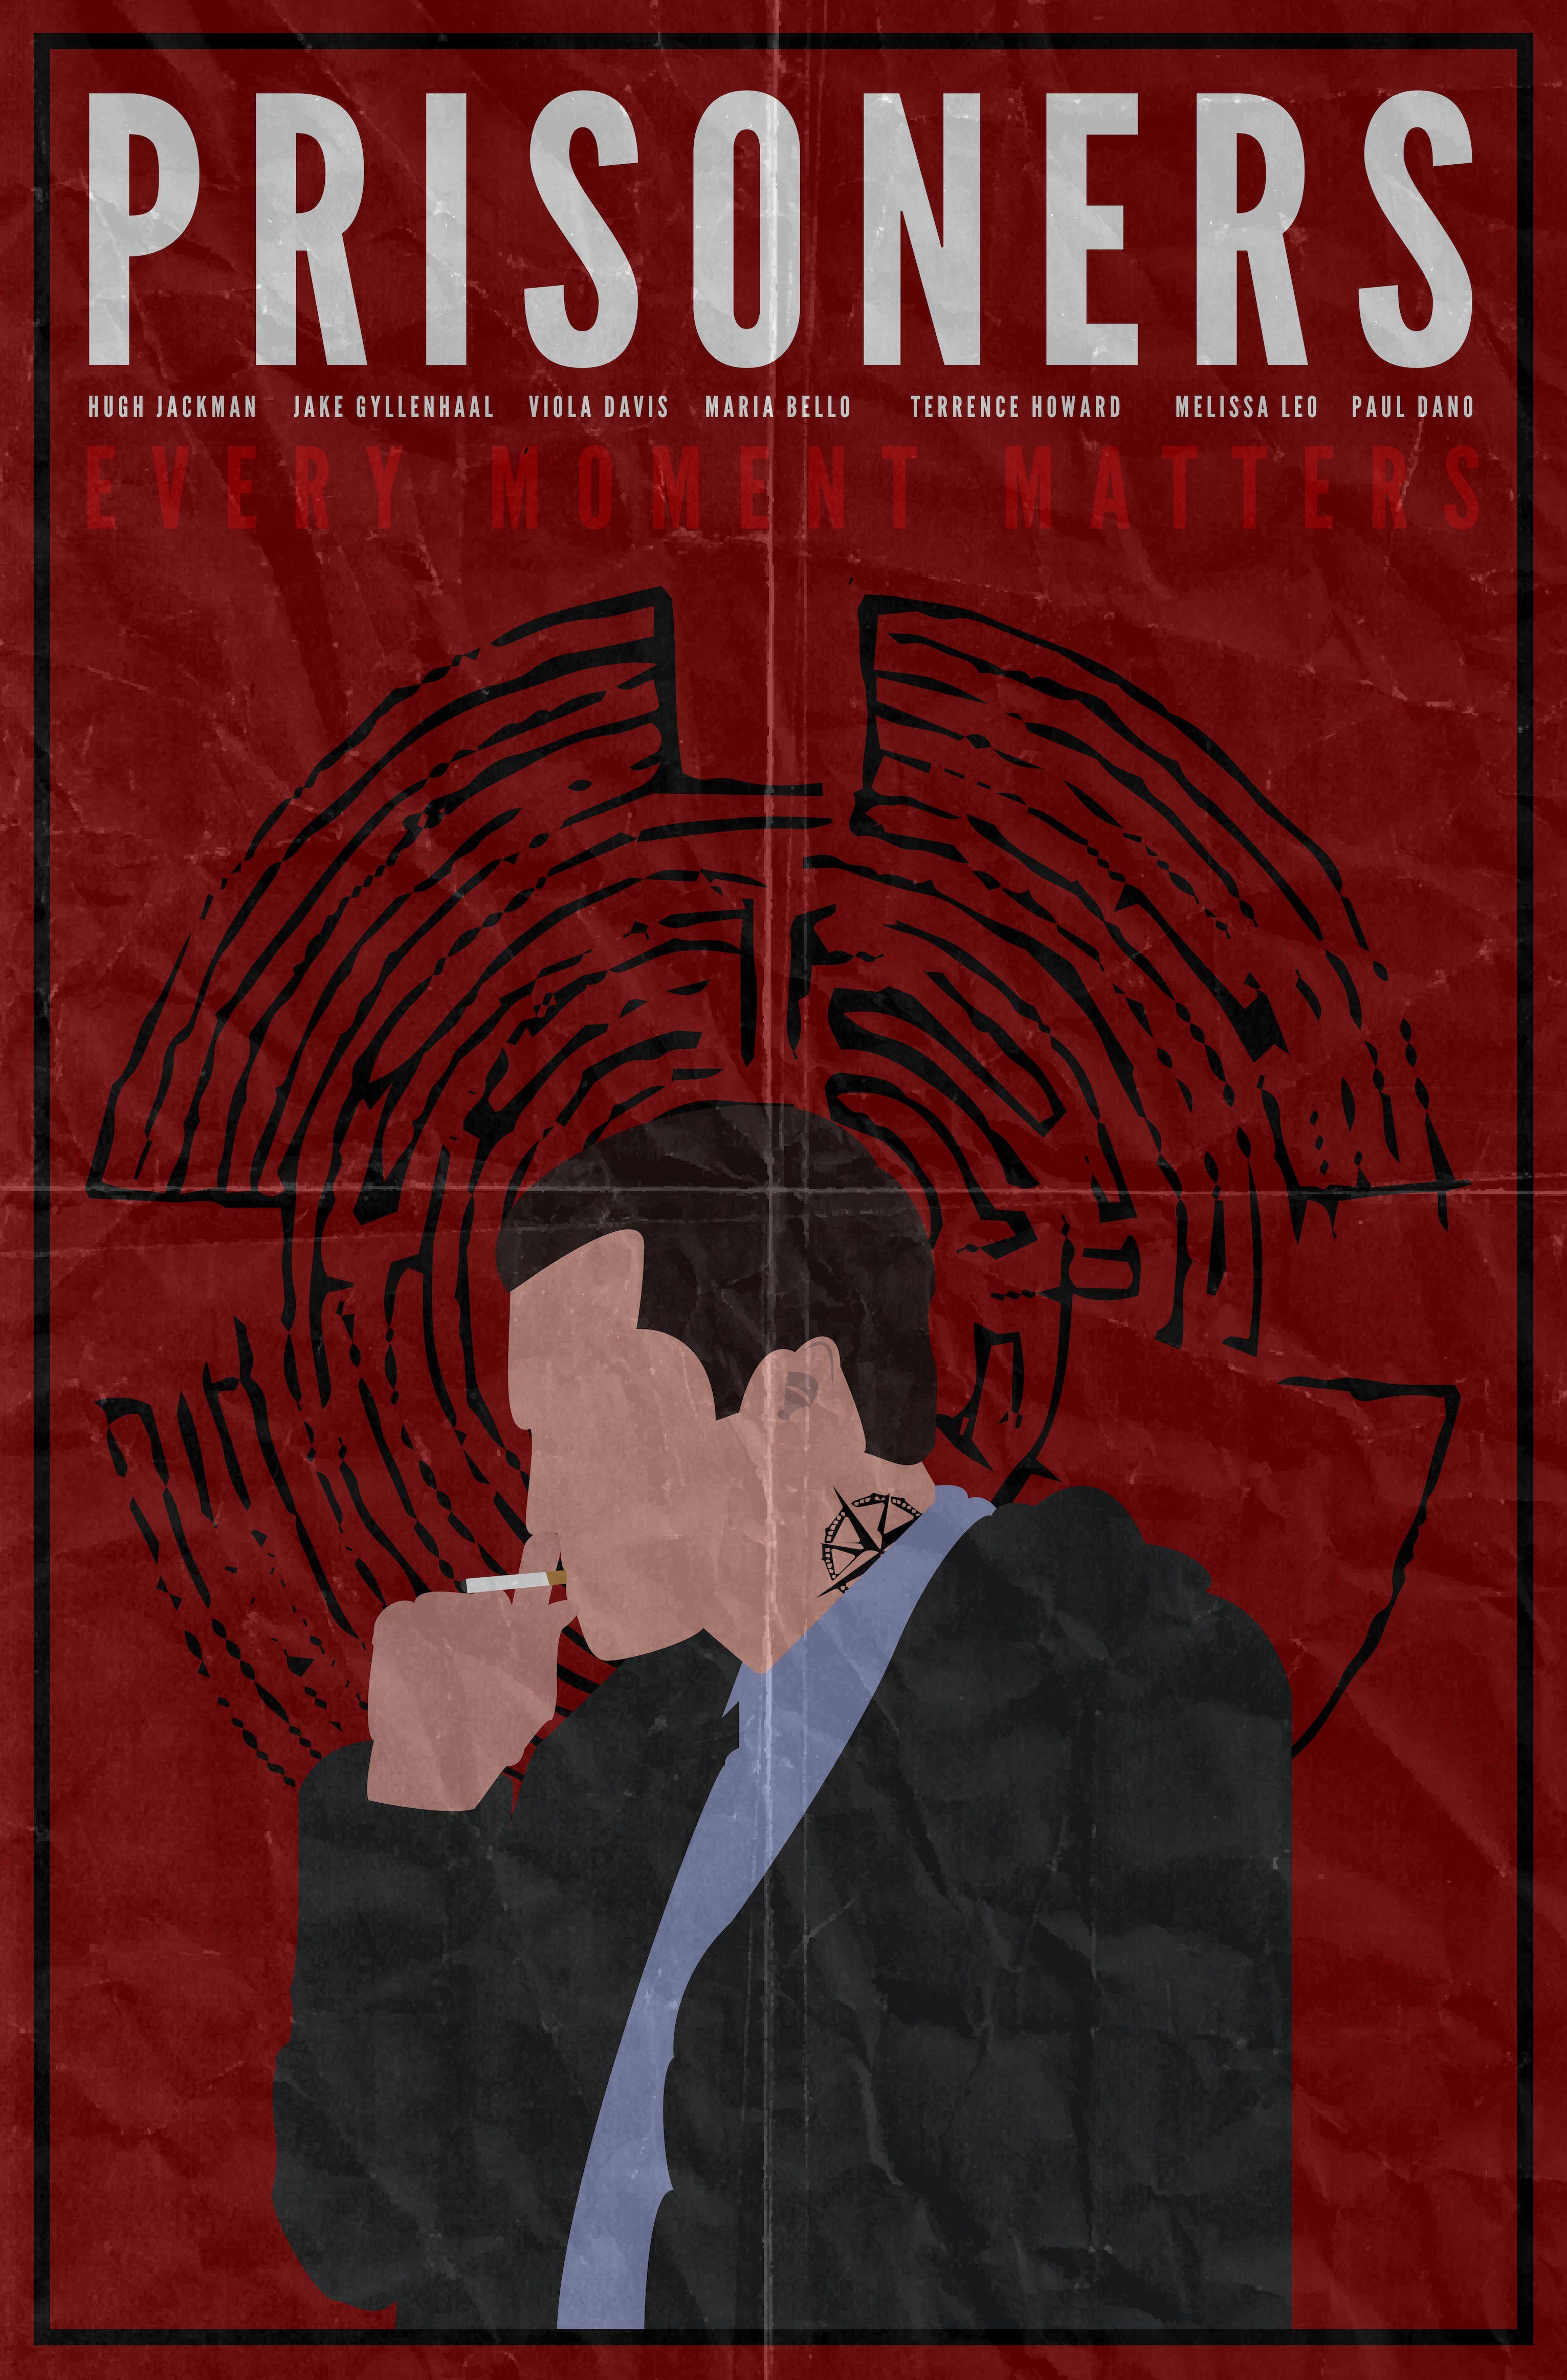 Poster design tumblr - Prisoners Minimalist Poster Design By Patrick Curley Patrickcurley Tumblr Com